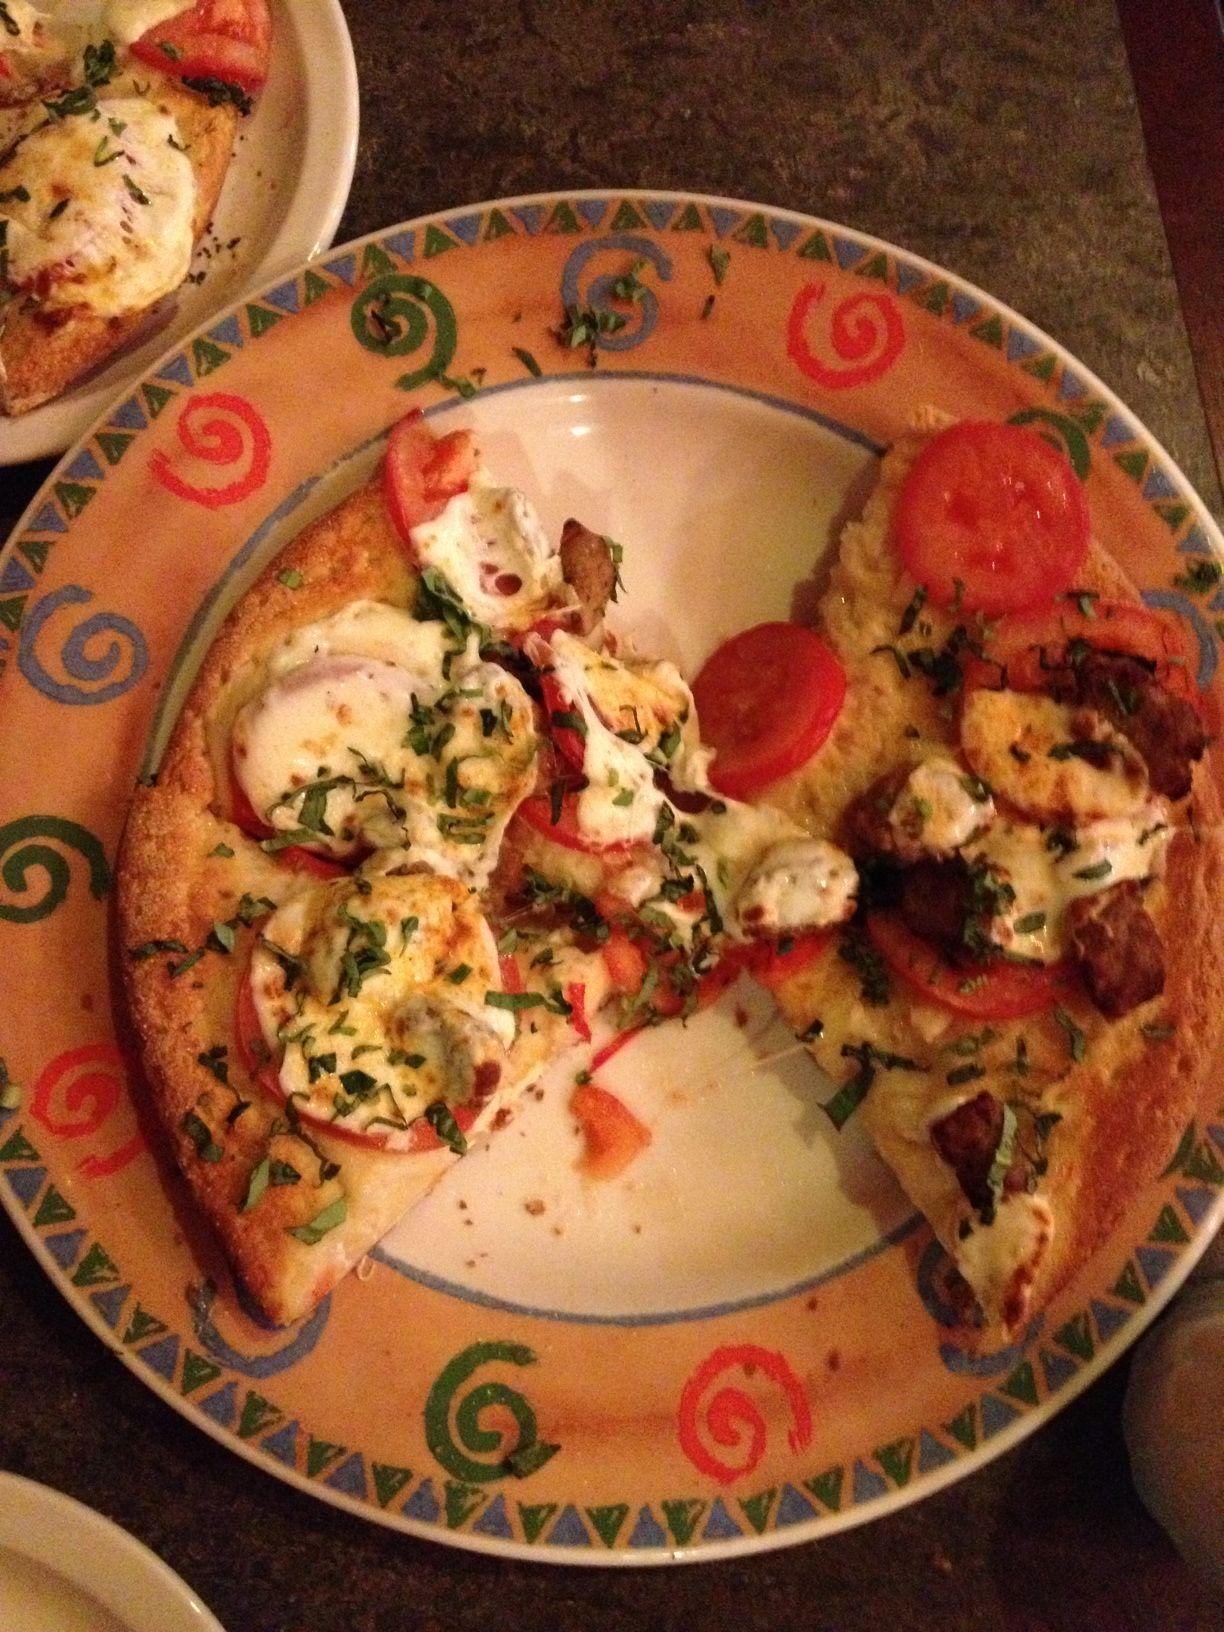 The Original Cottage Inn Italian Food Ann Arbor Mi Http Thedailysampler Com 2013 01 20 The Ann Arbor Sampler The Orig Italian Recipes Food Gourmet Pizza